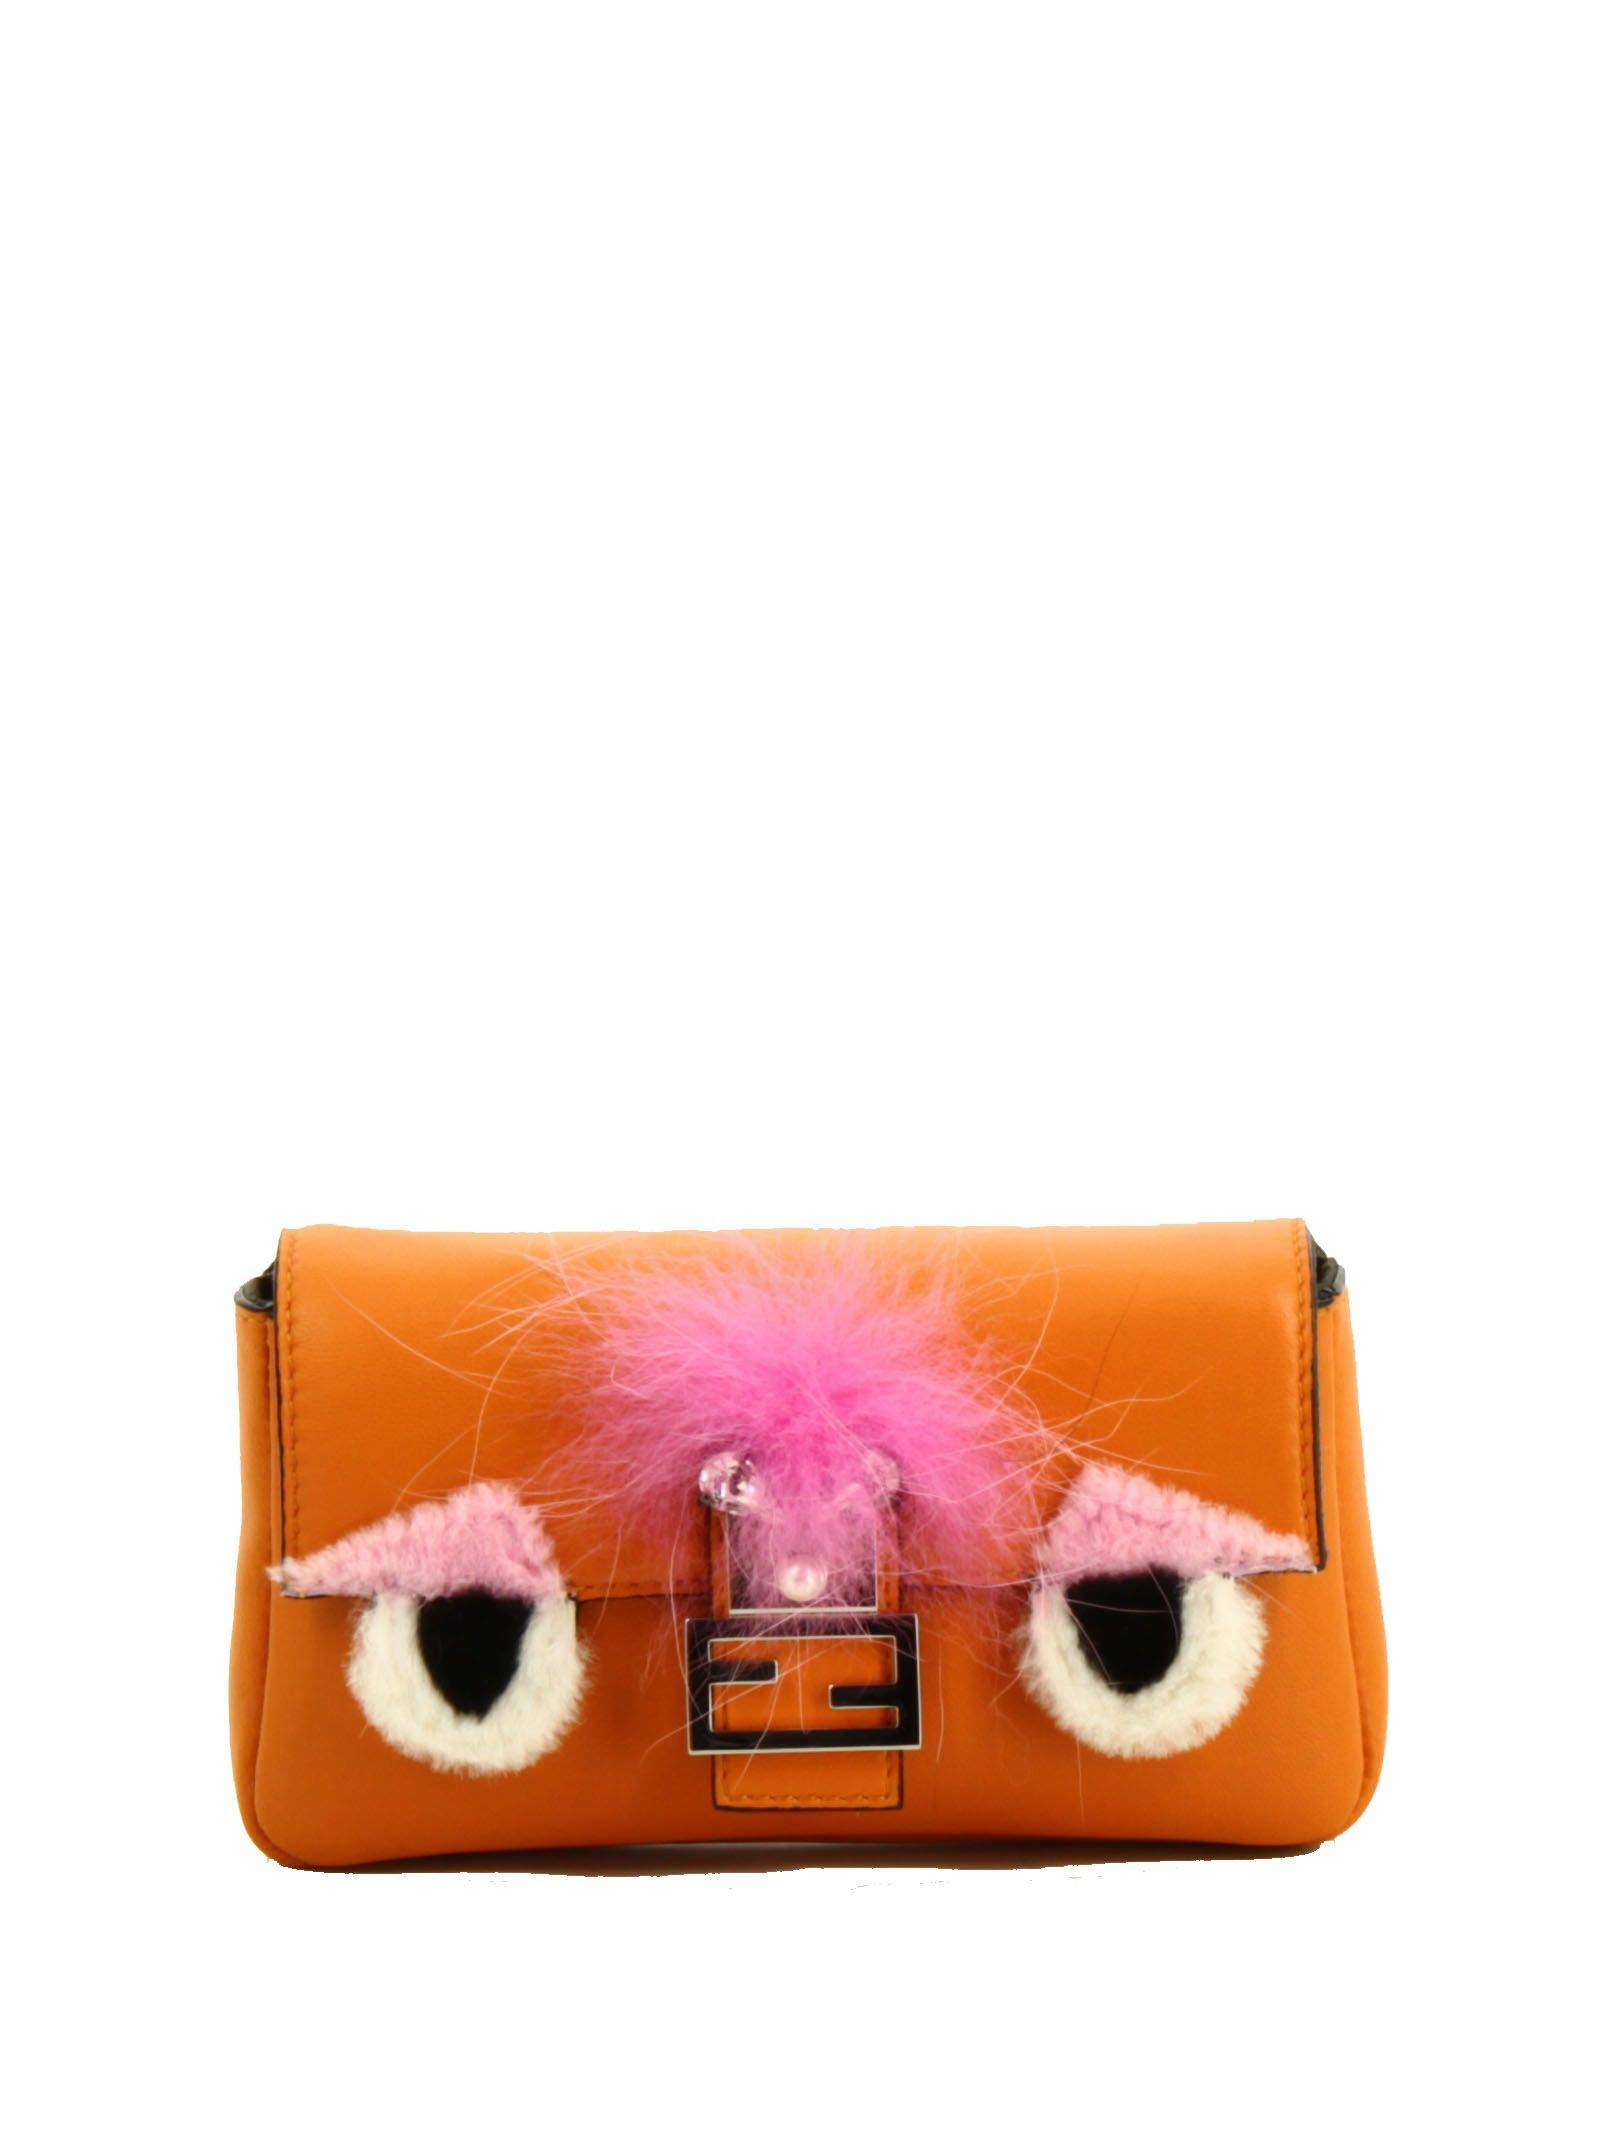 Fendi Women's 8M03543zqf0z6w-Mcf Orange Leather Shoulder Bag